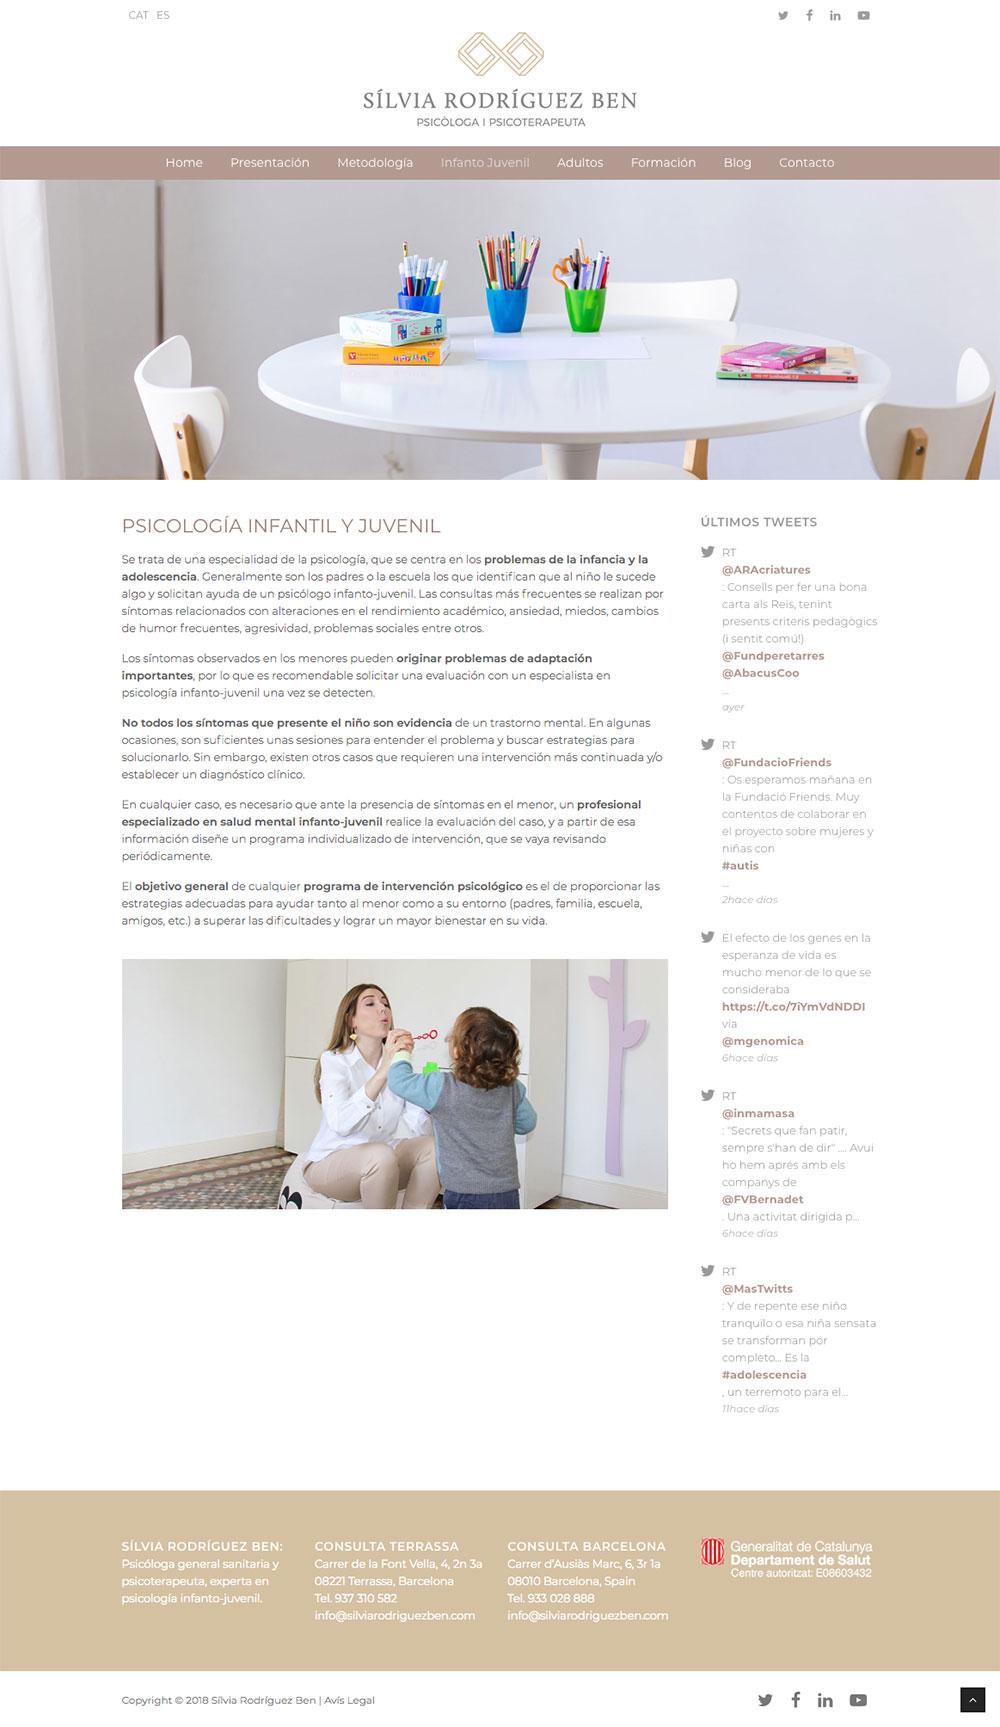 Sílvia Rodríguez Ben ★ Psicóloga y Psicoterapeuta ★ Website